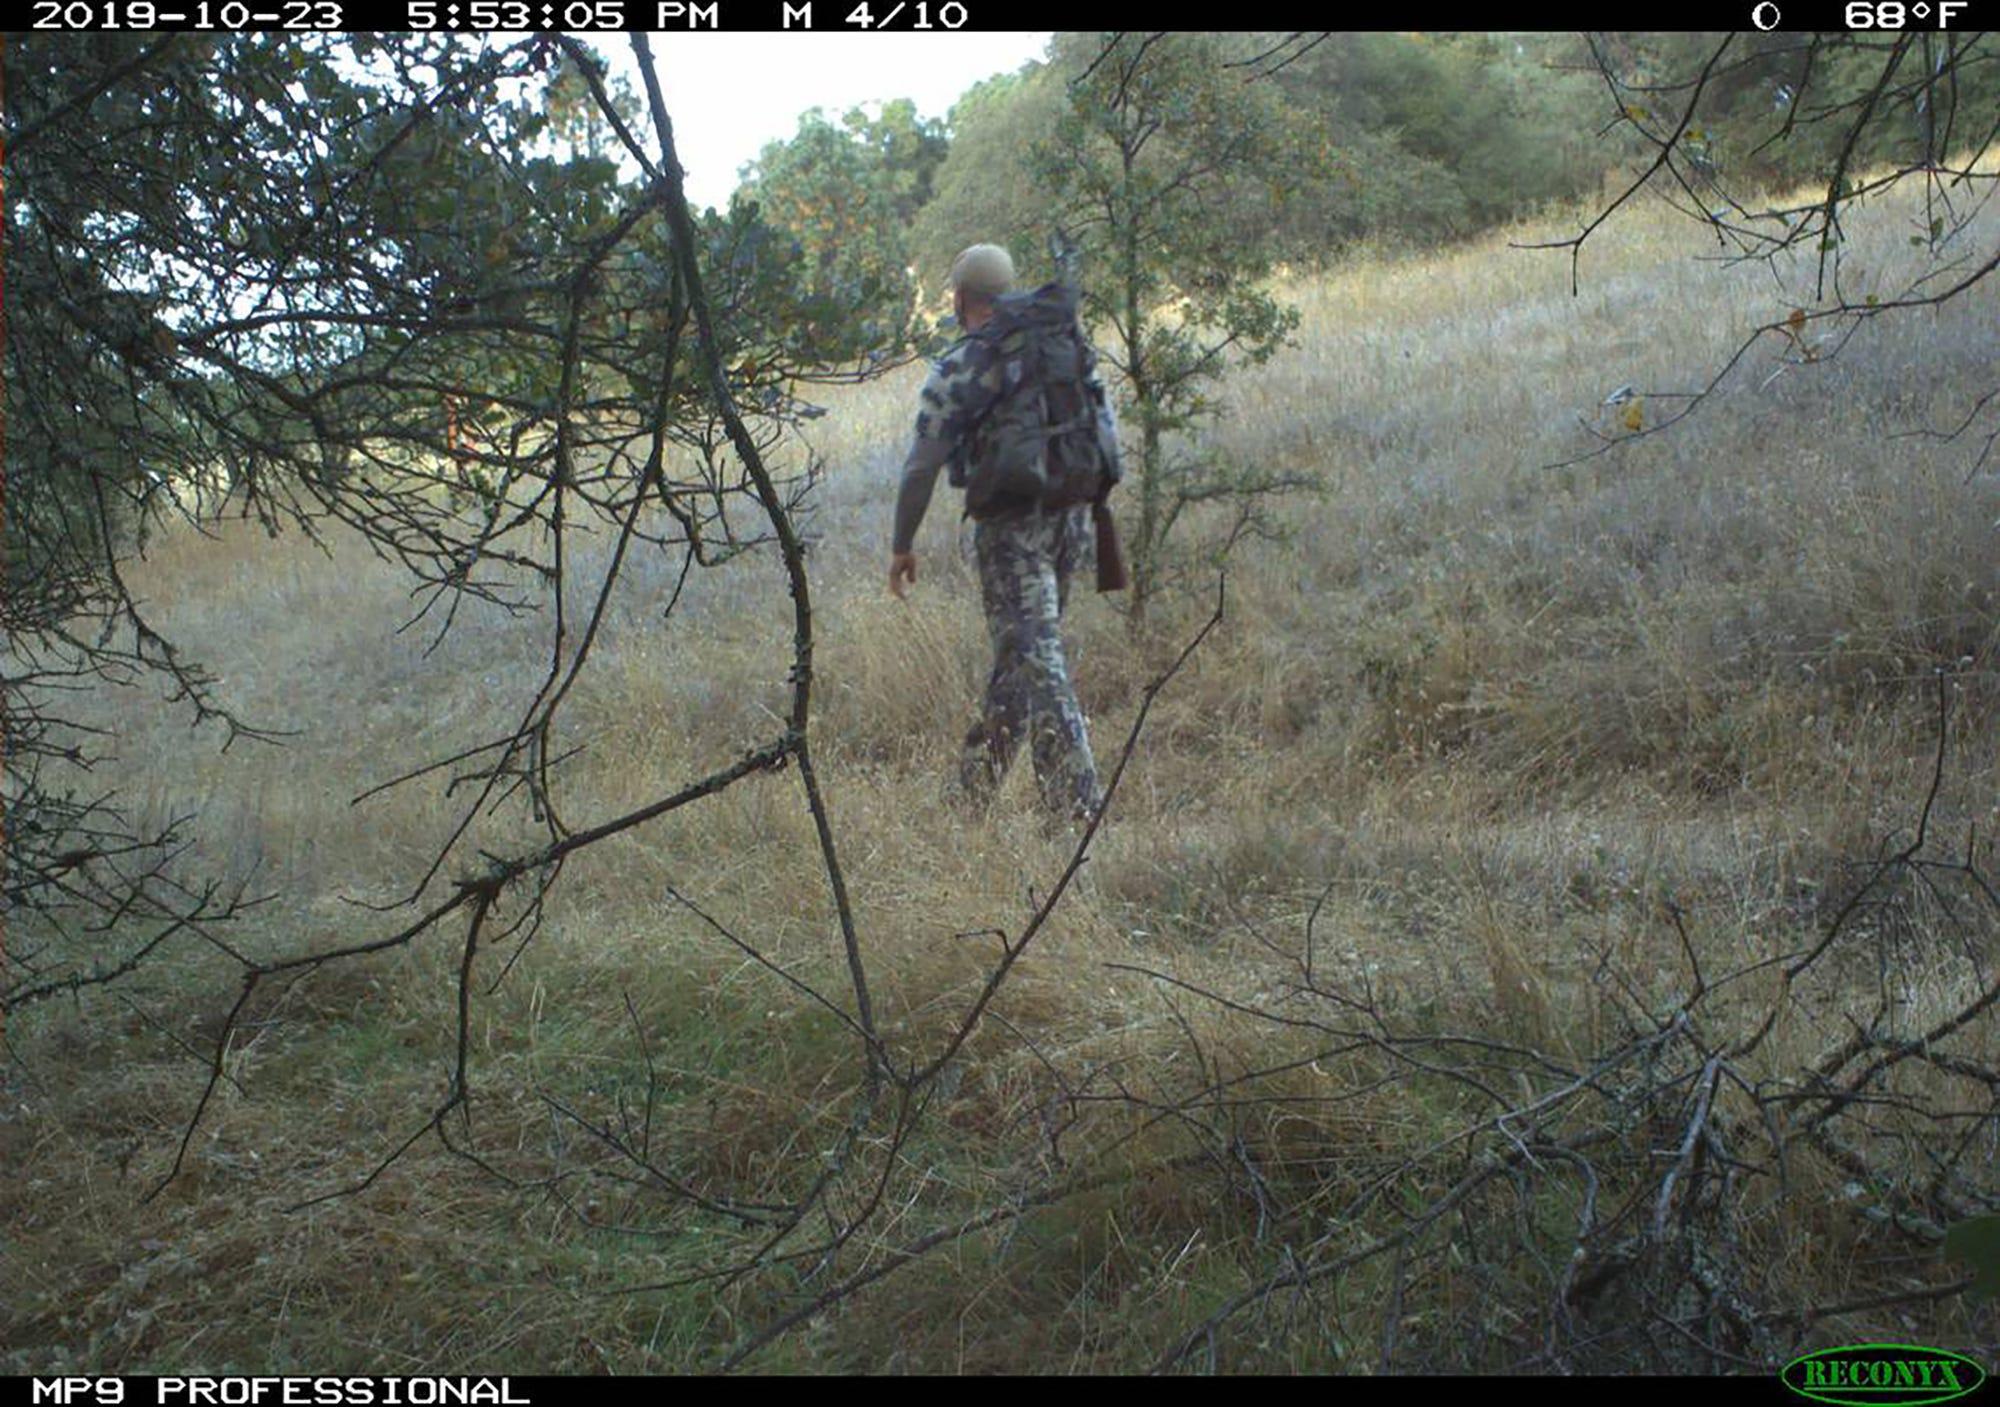 How California snared 2 elite hunters posting kills on social media 2